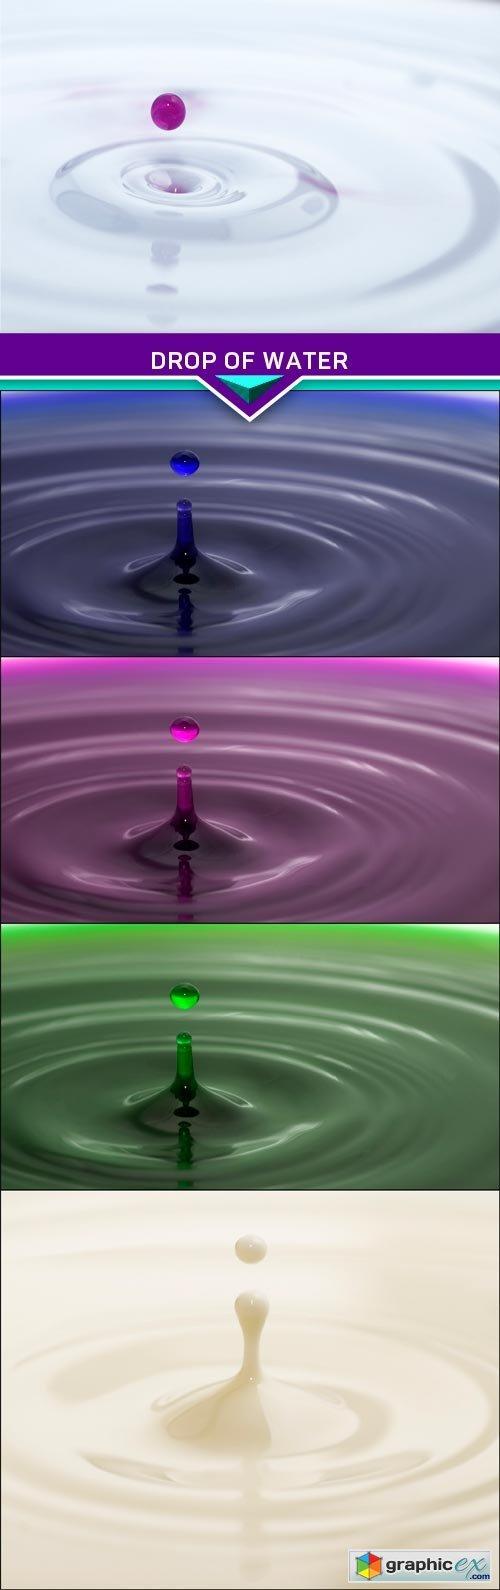 Drop of water 5x JPEG